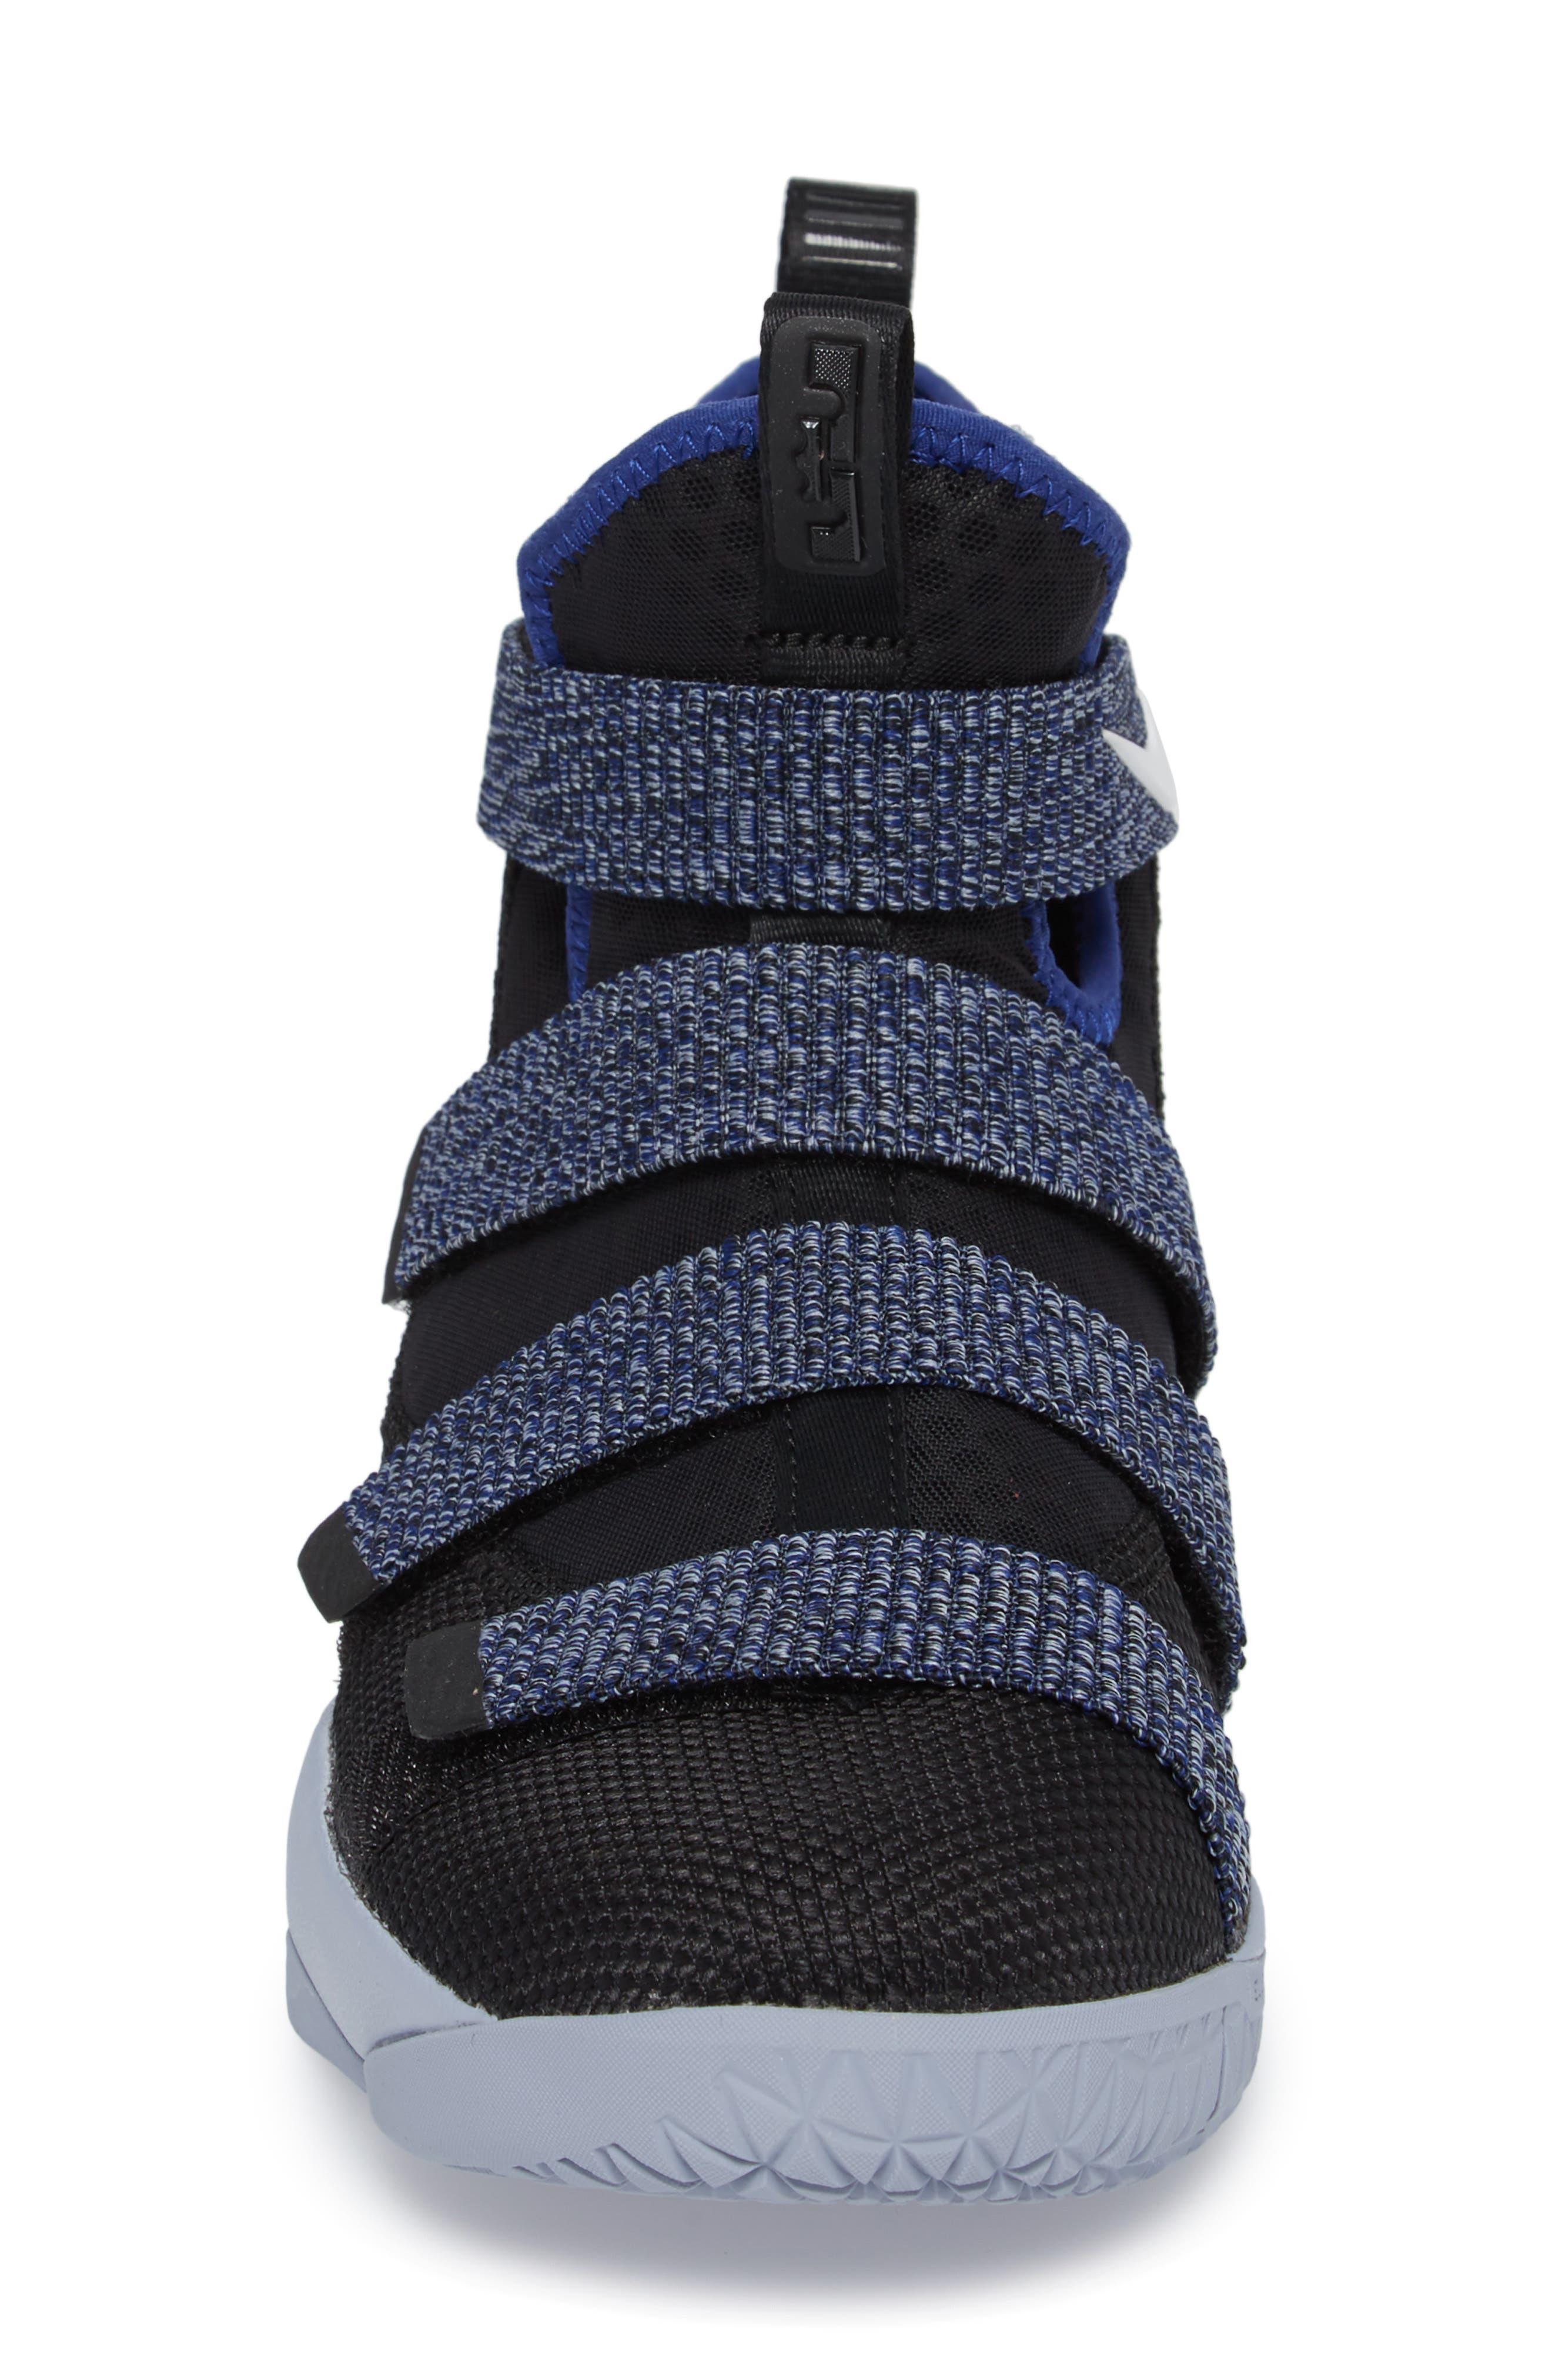 NIKE,                             LeBron Soldier XI Basketball Shoe,                             Alternate thumbnail 4, color,                             005